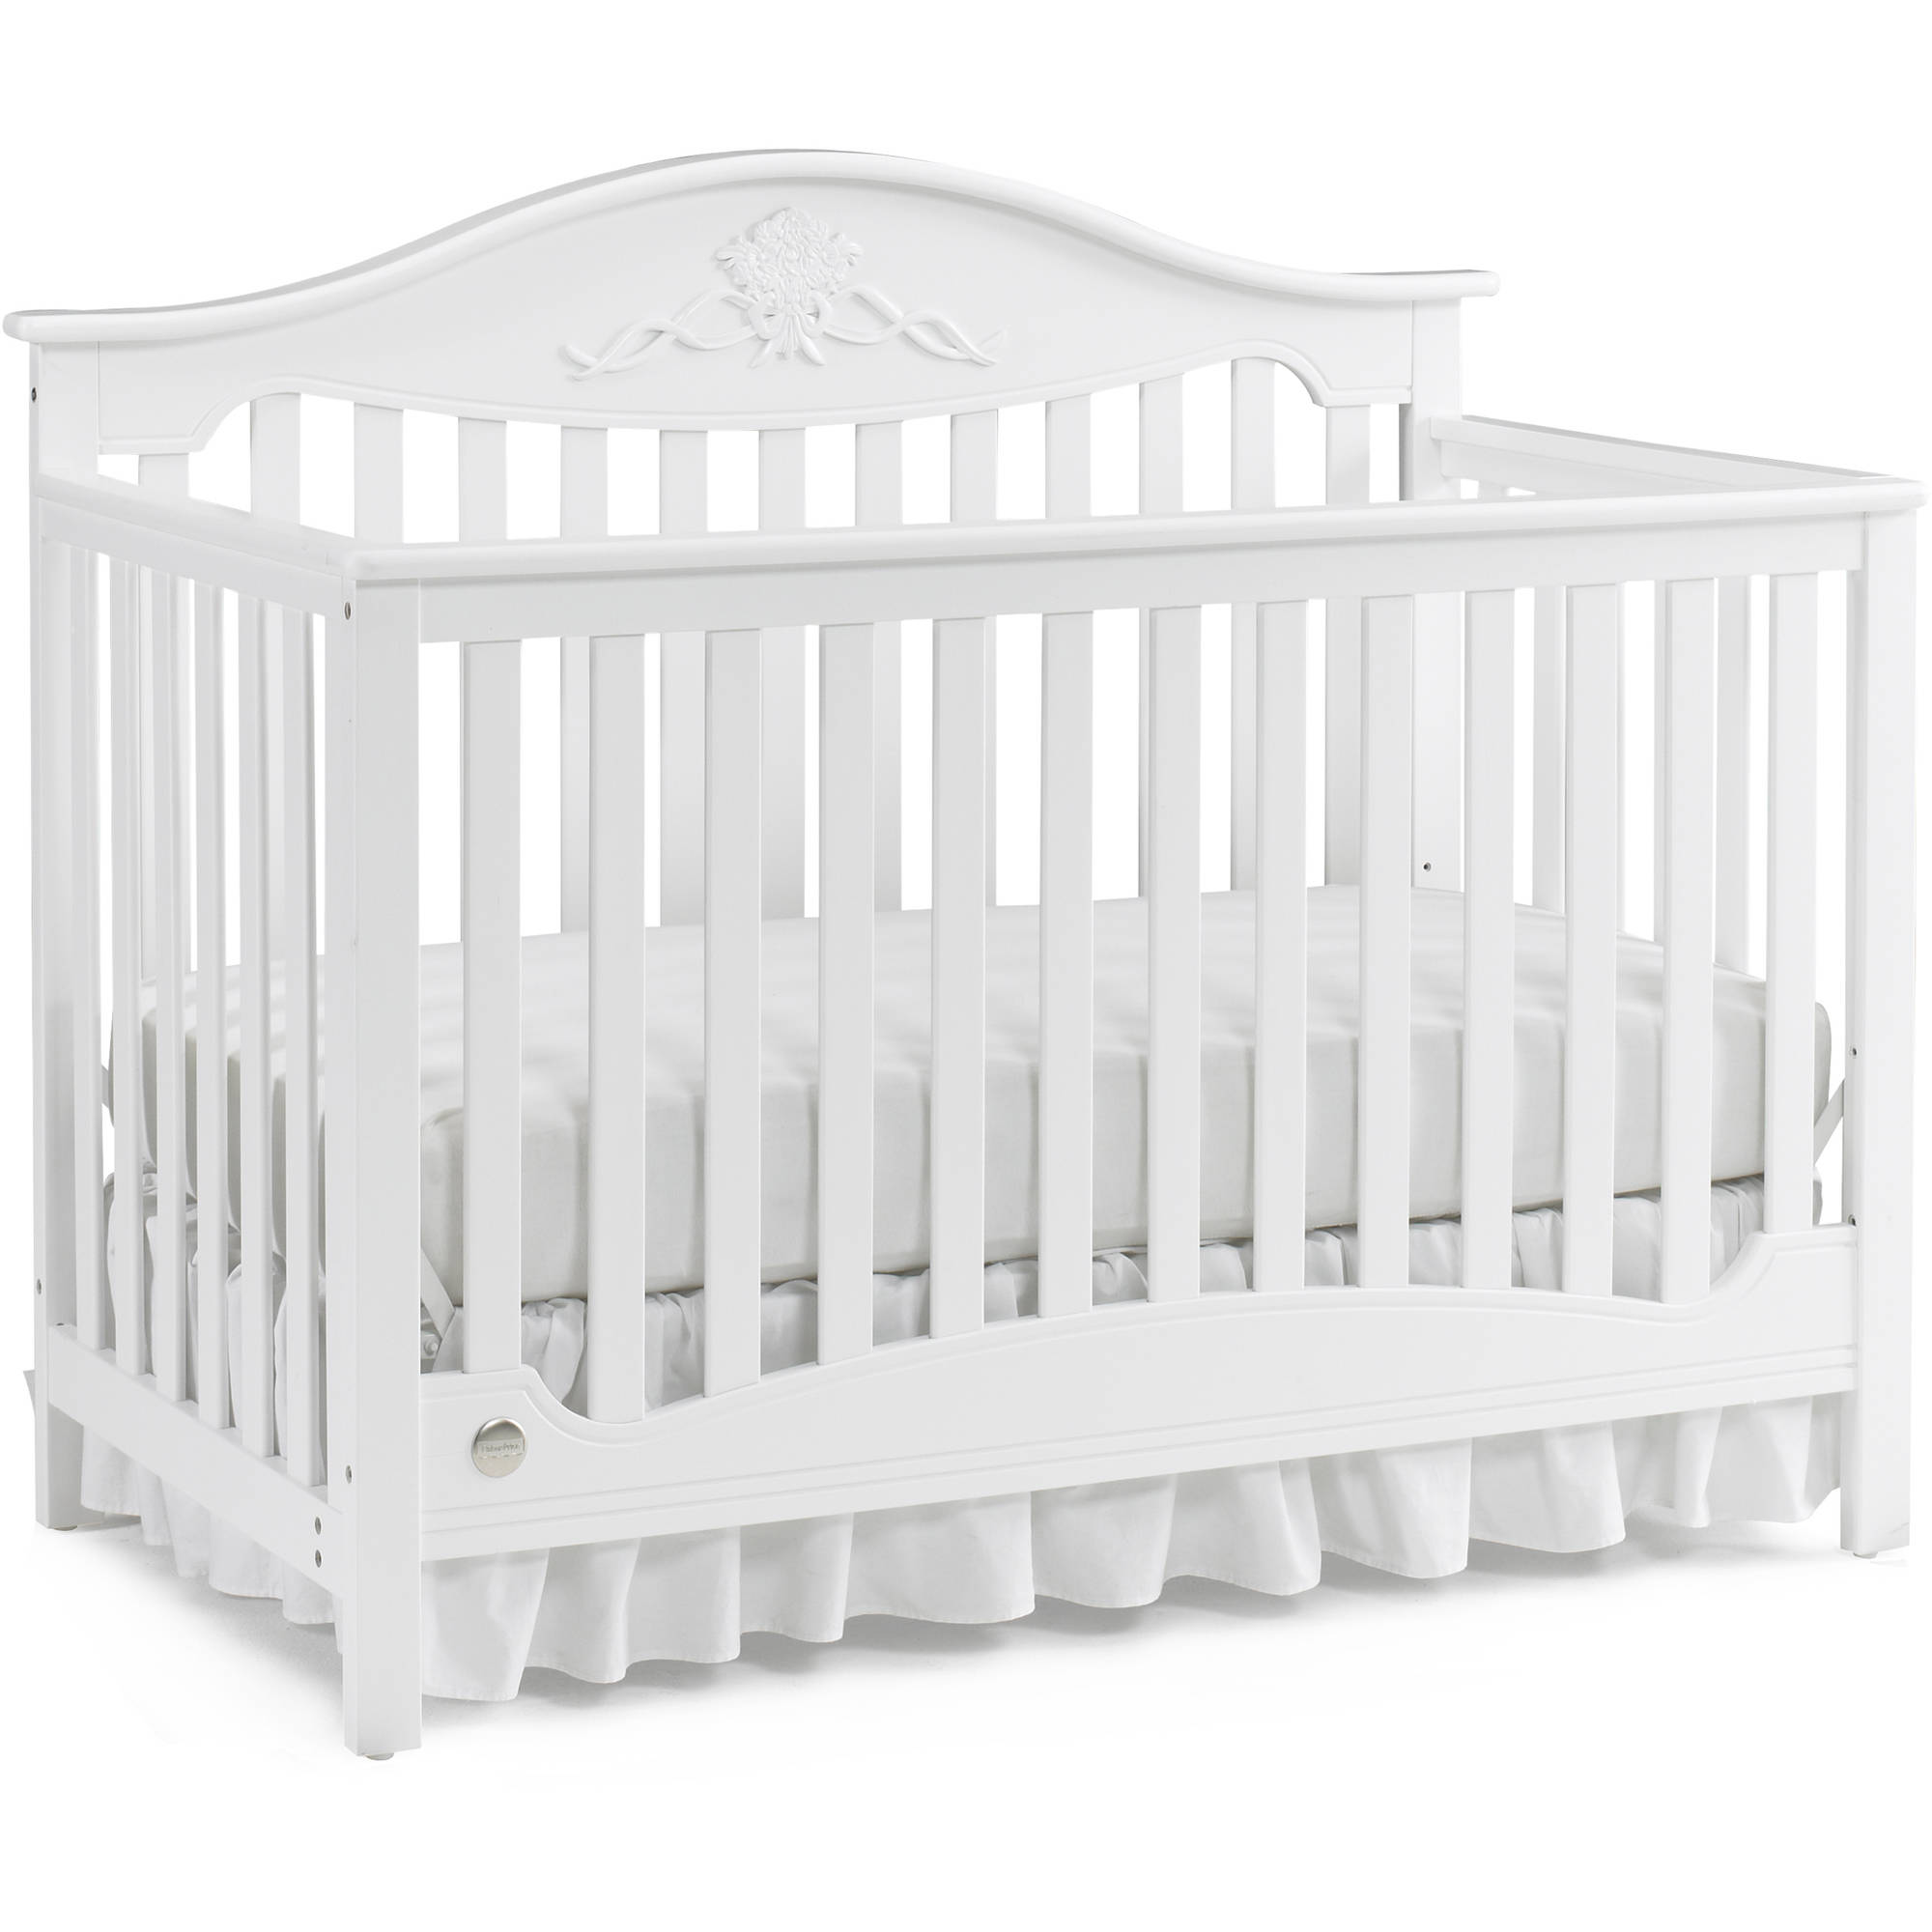 baby beds https://i5.walmartimages.com/asr/dfc12cc7-3bcb-43a... ALPYDWZ